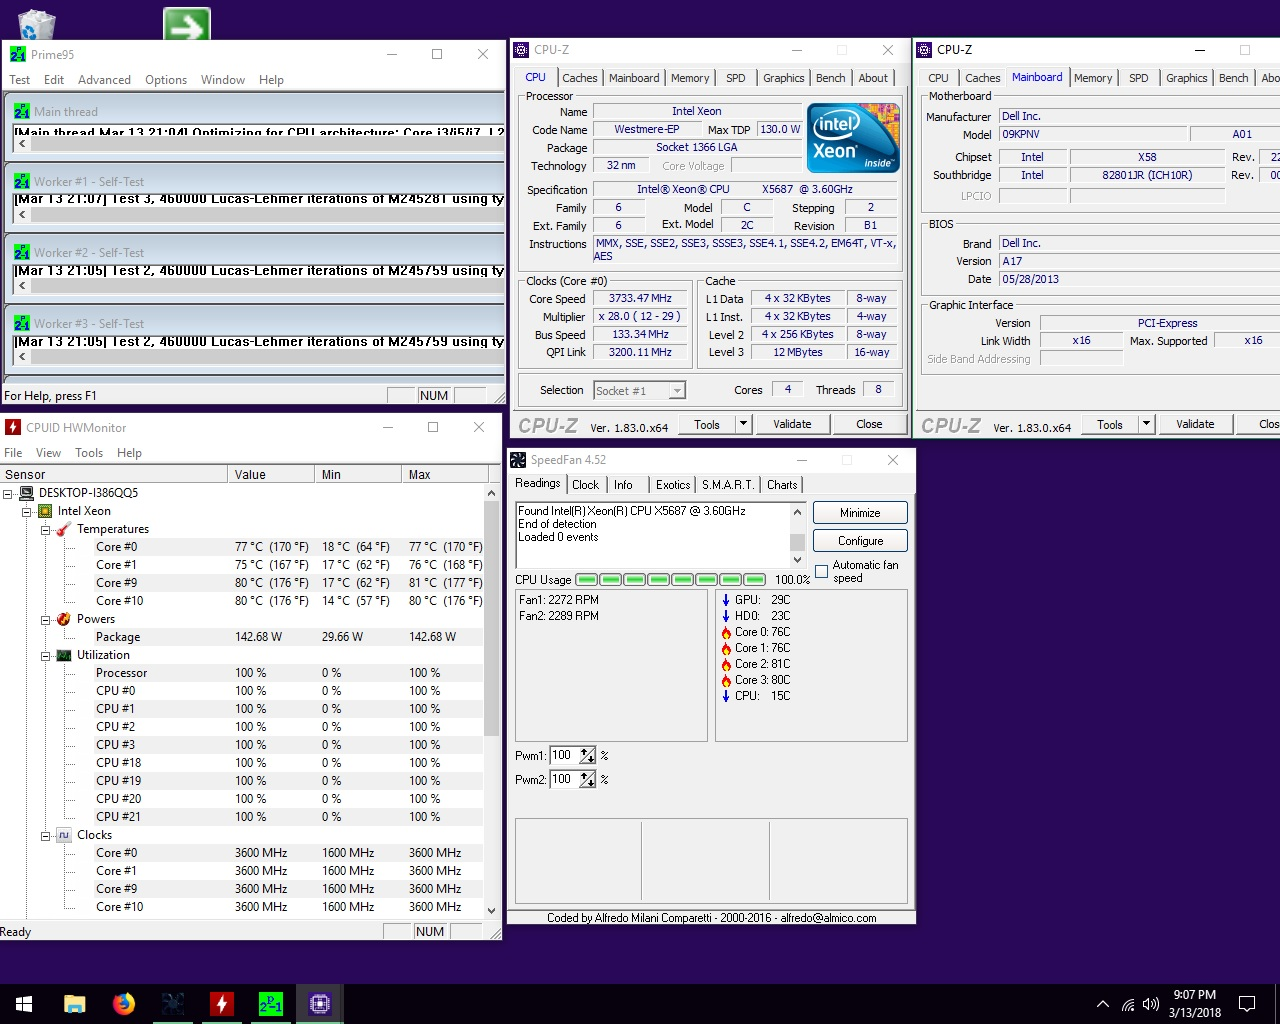 Throttlestop overclocking Desktop PCs | Page 5 | TechPowerUp Forums